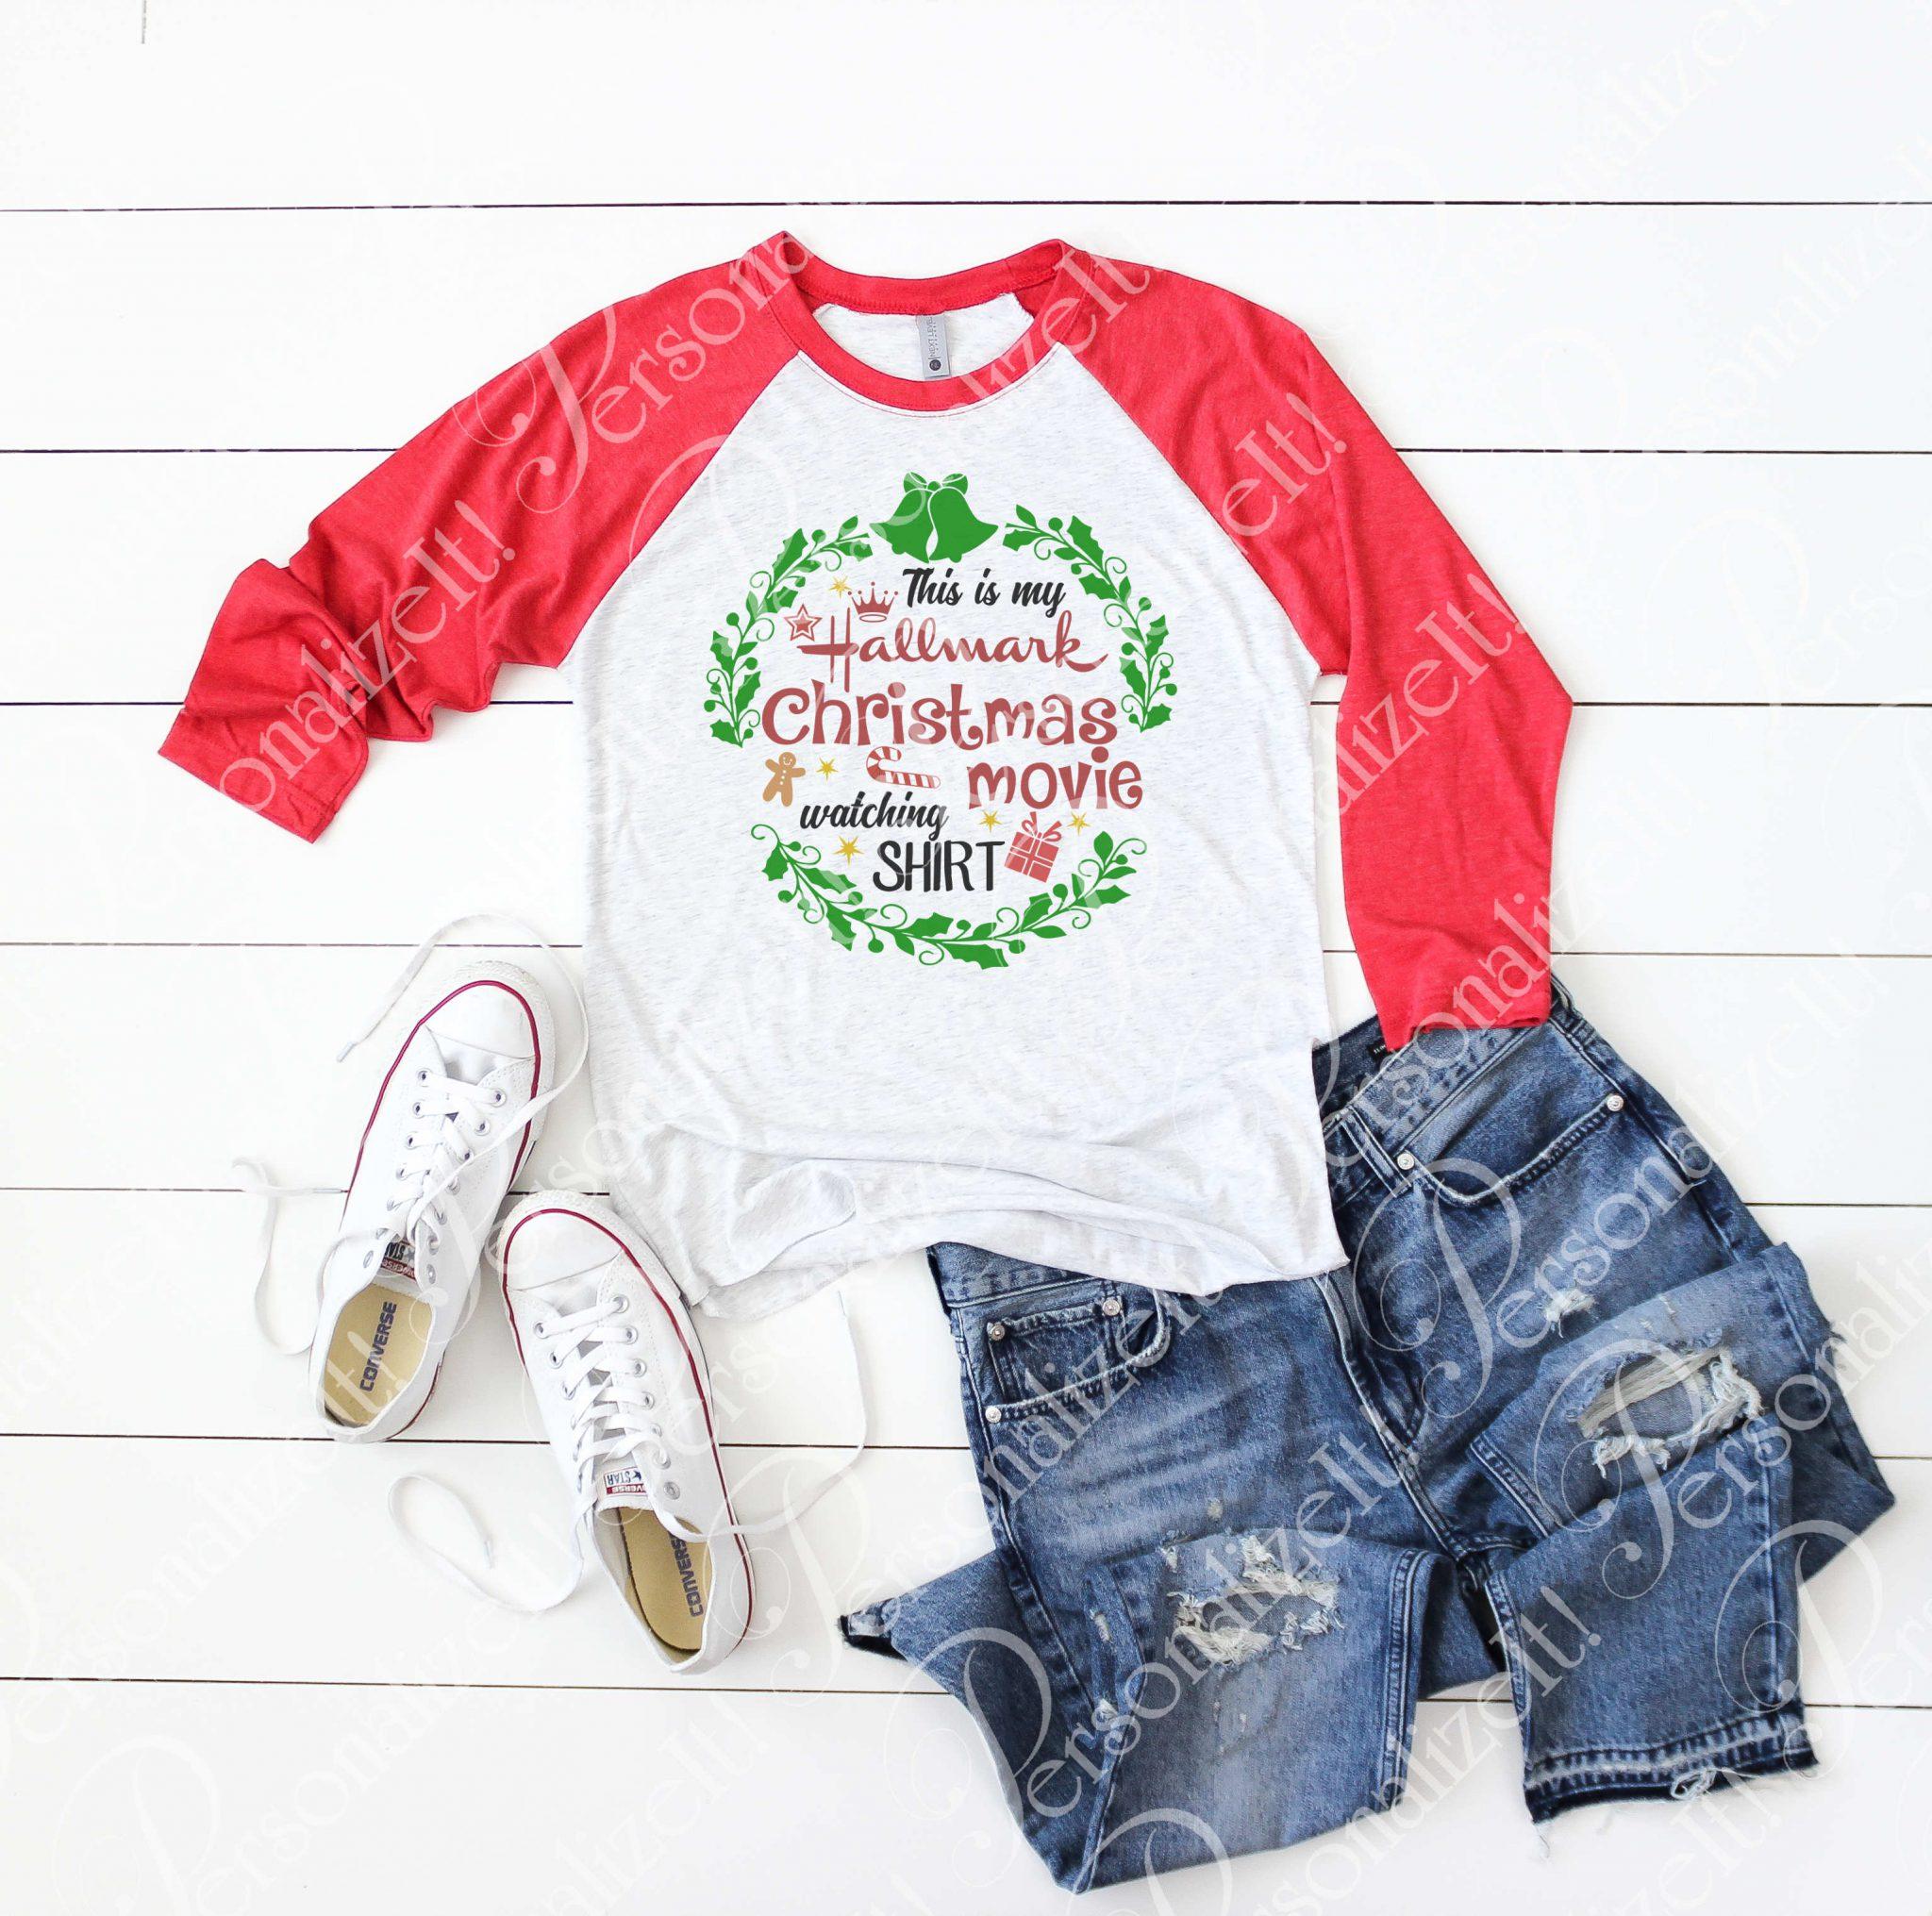 Hallmark Christmas Shirt.Vintage Print This Is My Hallmark Movie Watching Shirt Raglan Baseball Tshirt Black Or Red Sleeves